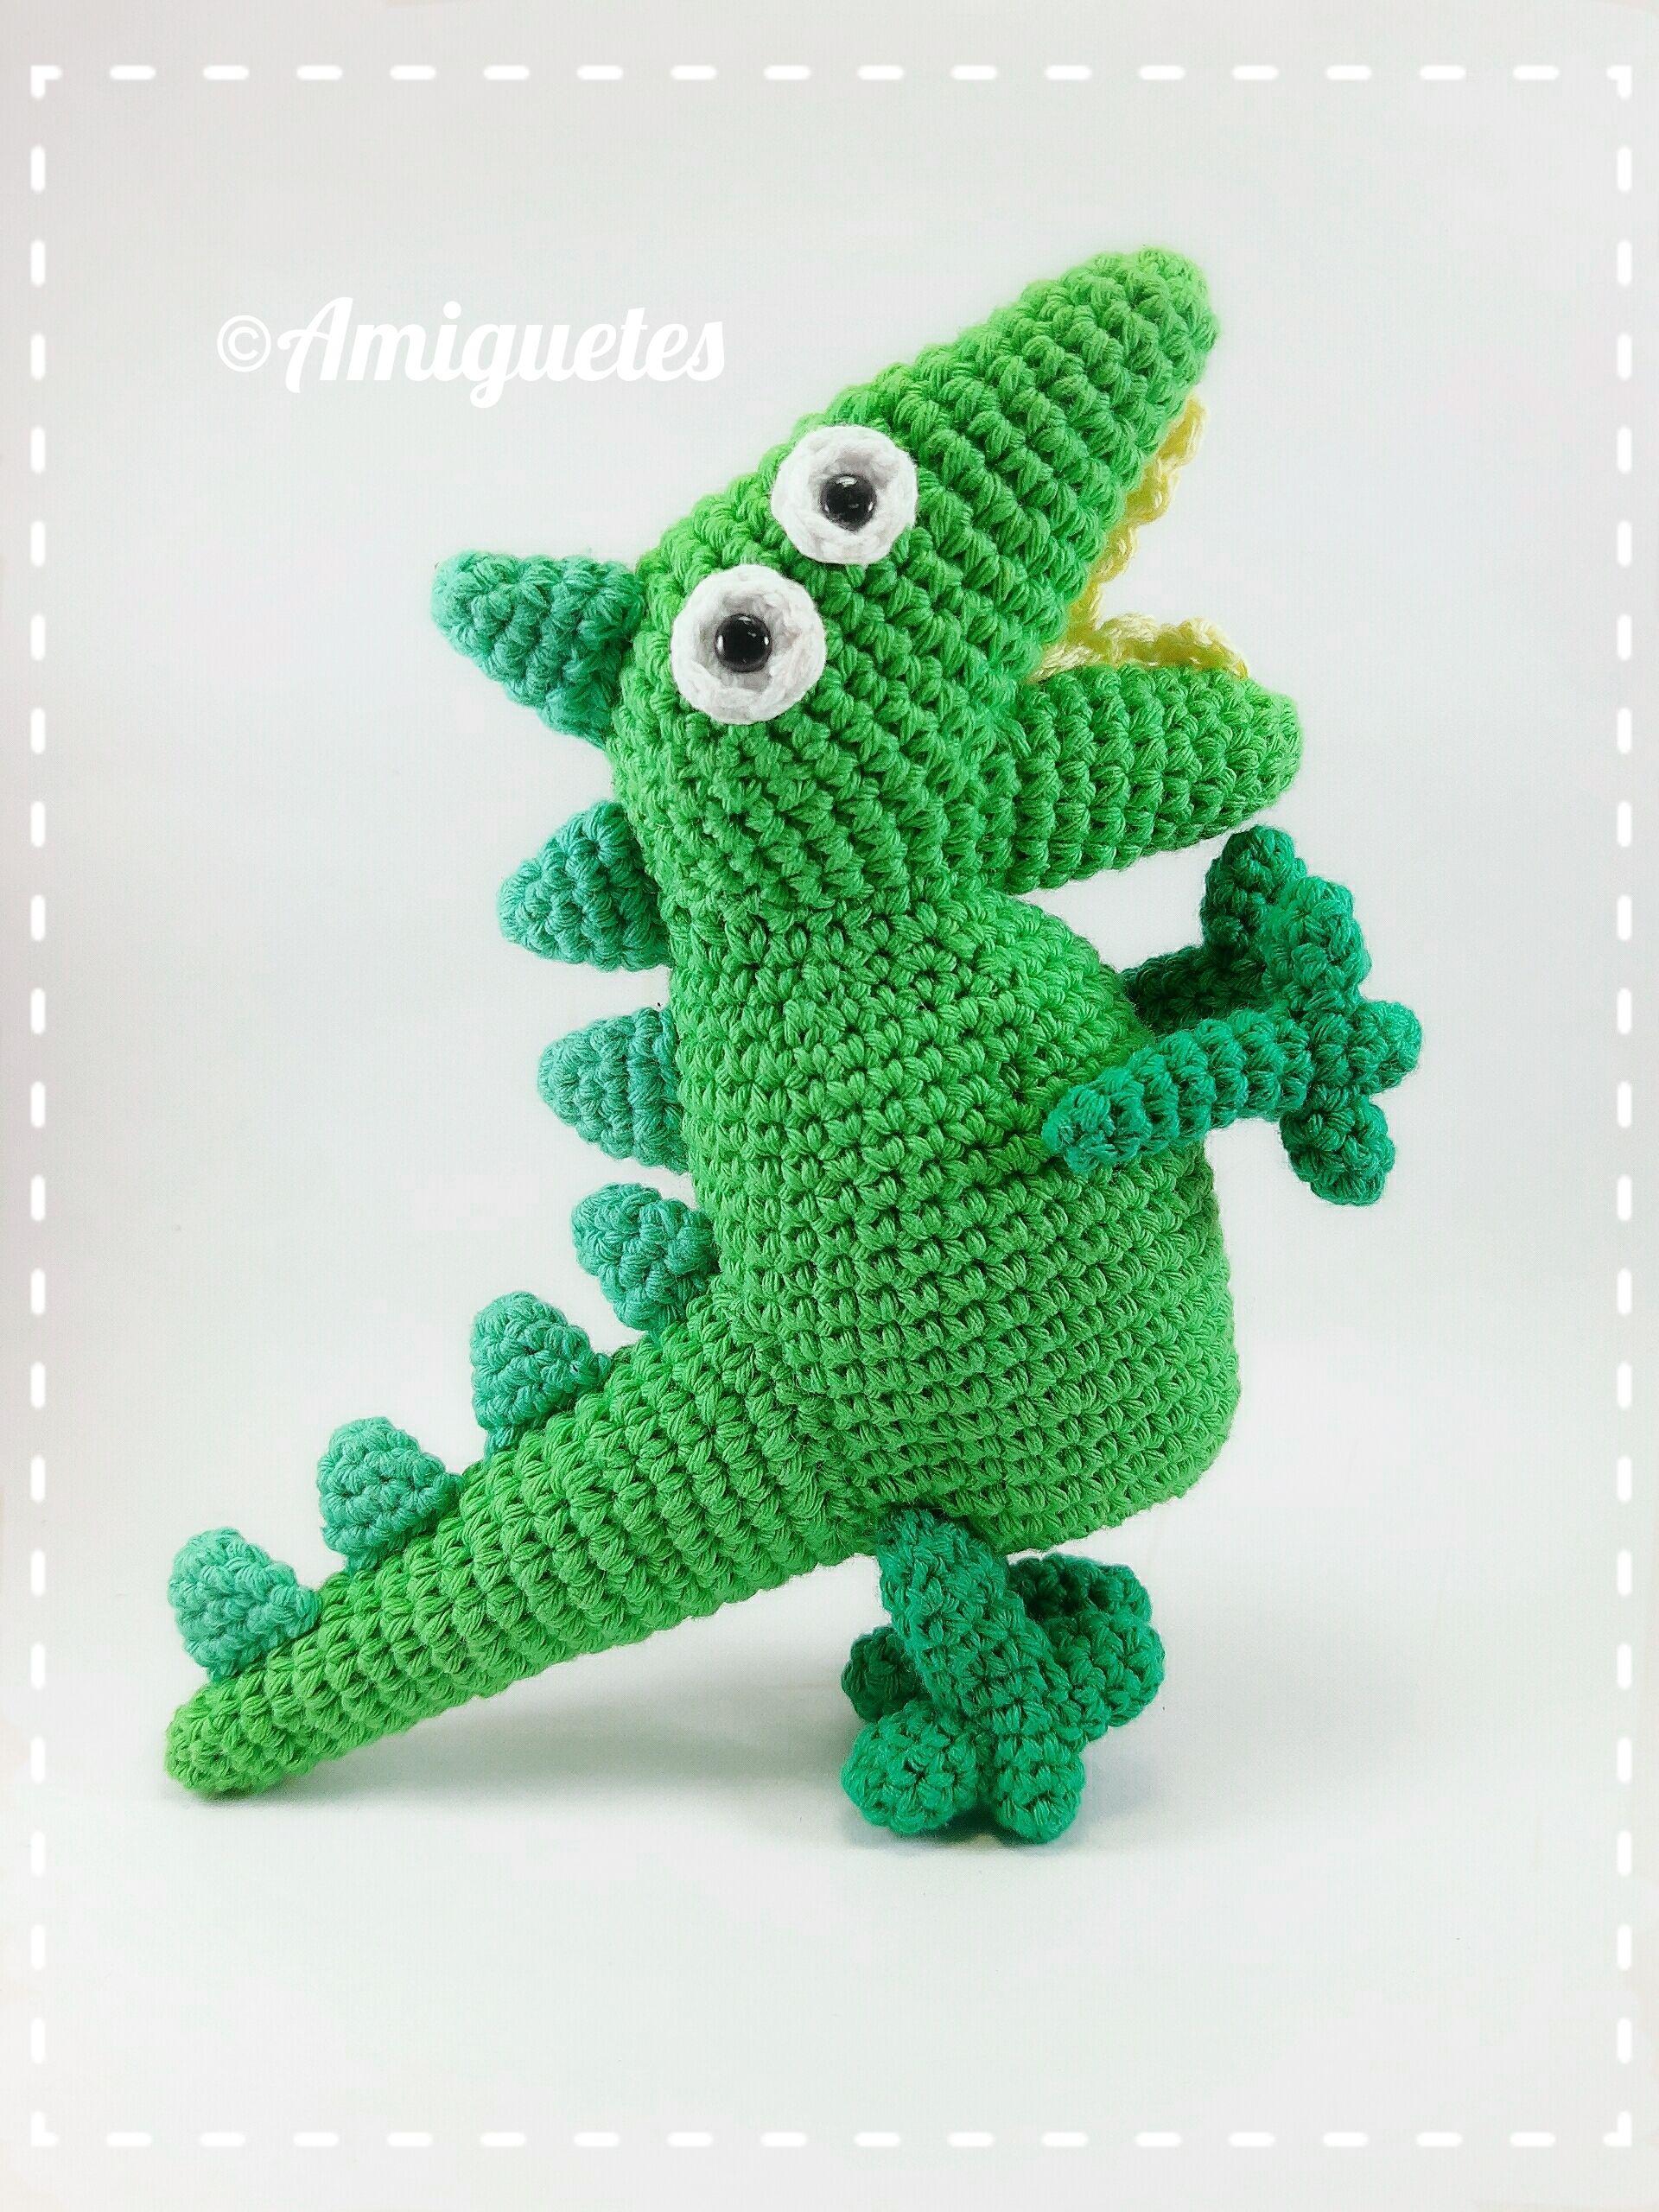 Crochet Amigurumi Dinosaur Free Patterns | Ganchillo amigurumi ... | 2560x1920